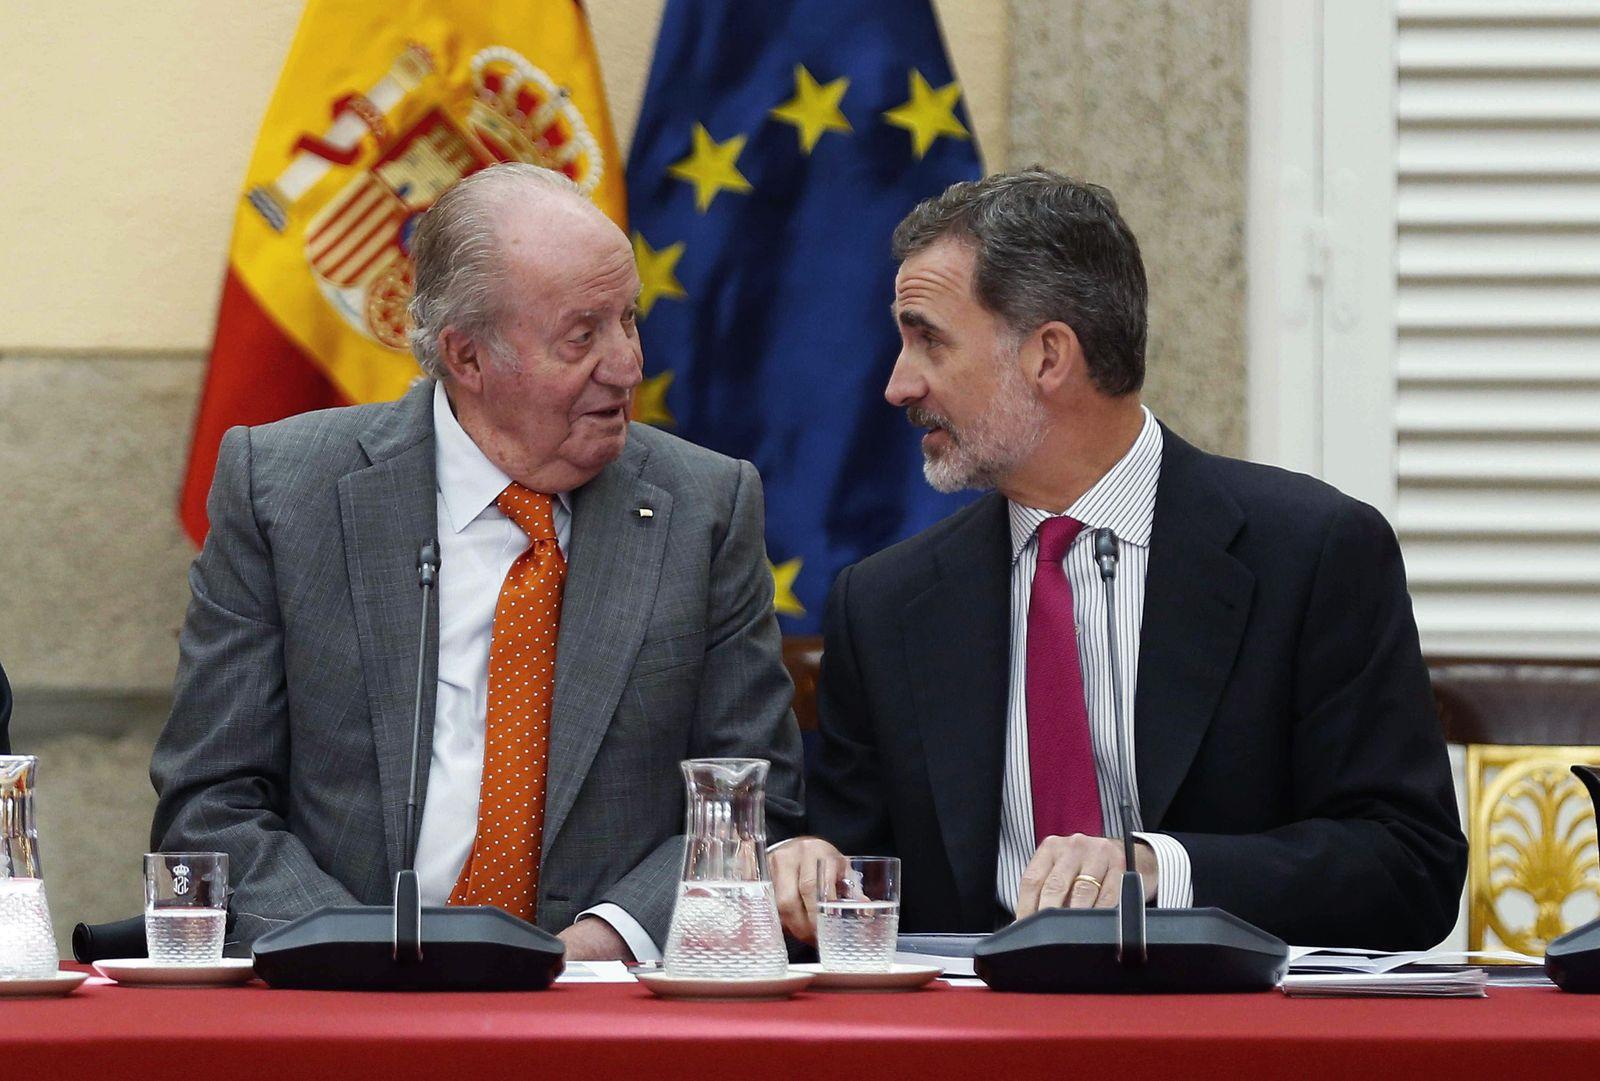 King Felipe VI renounces his father's heritage, Madrid, Spain - 15 Mar 2020